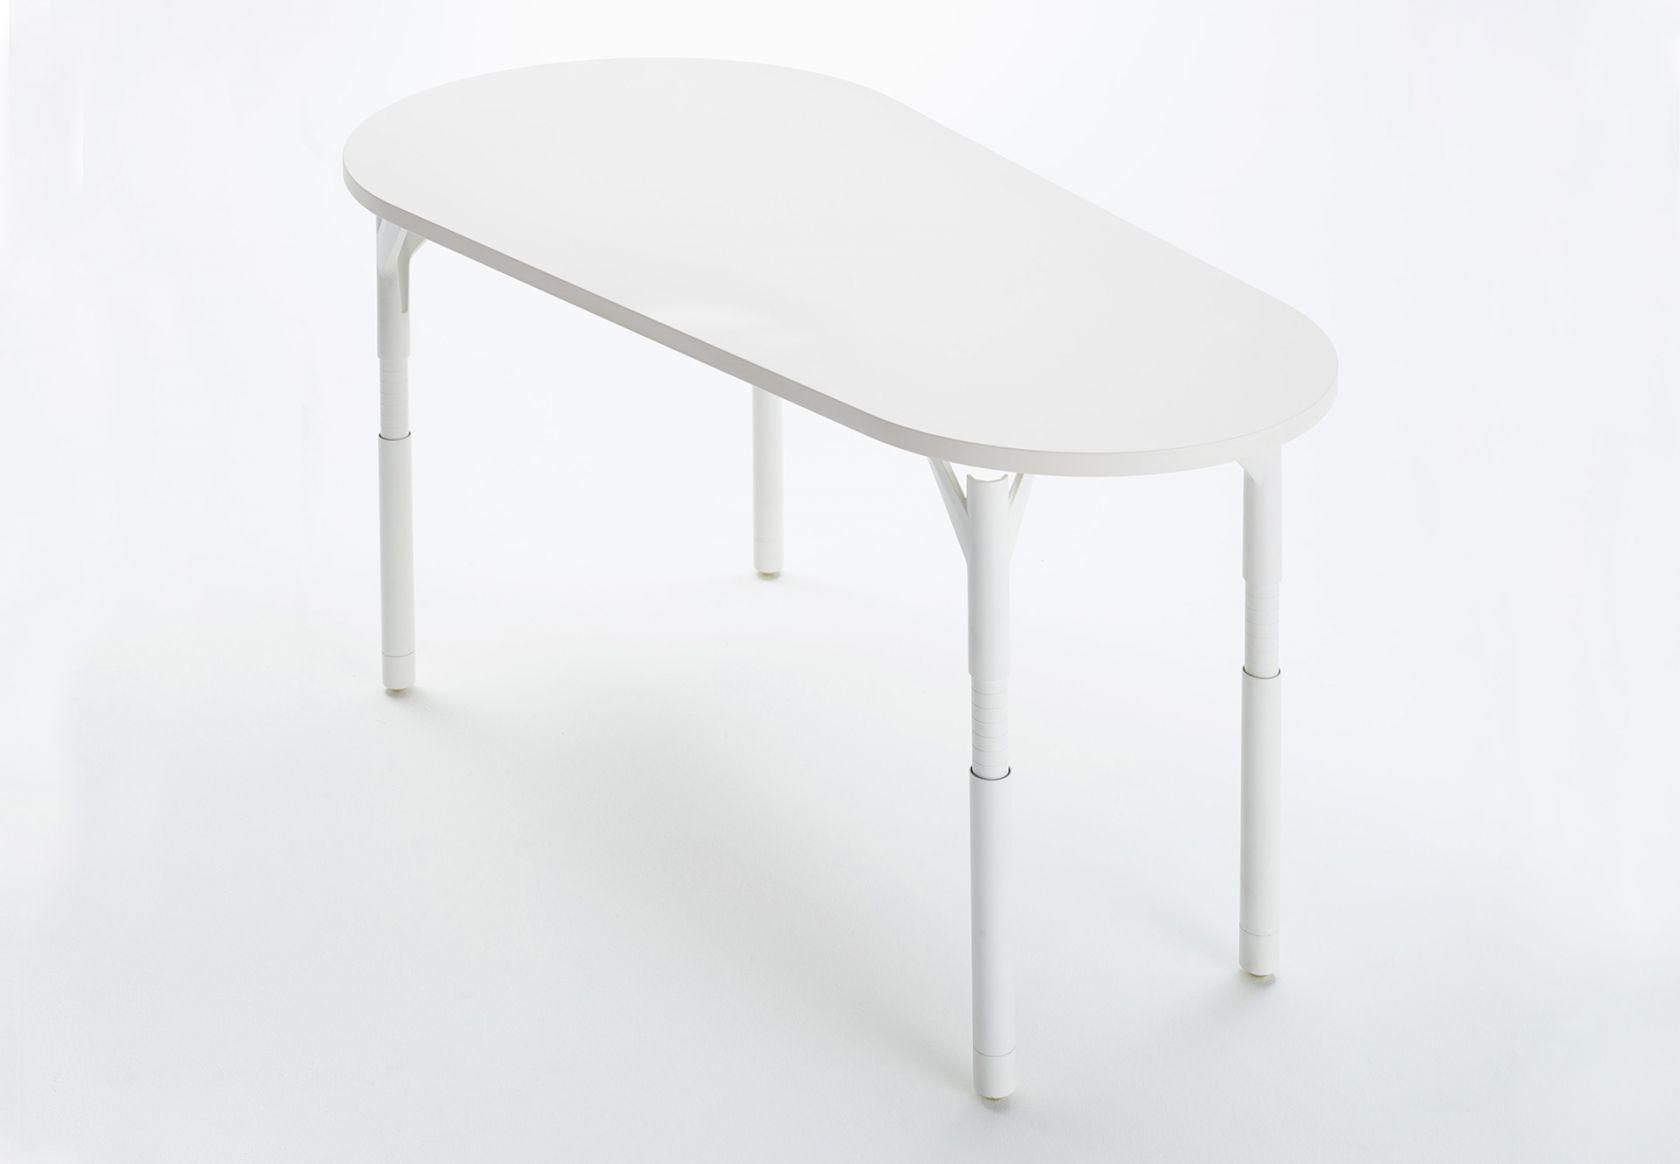 Climate Teardrop Table